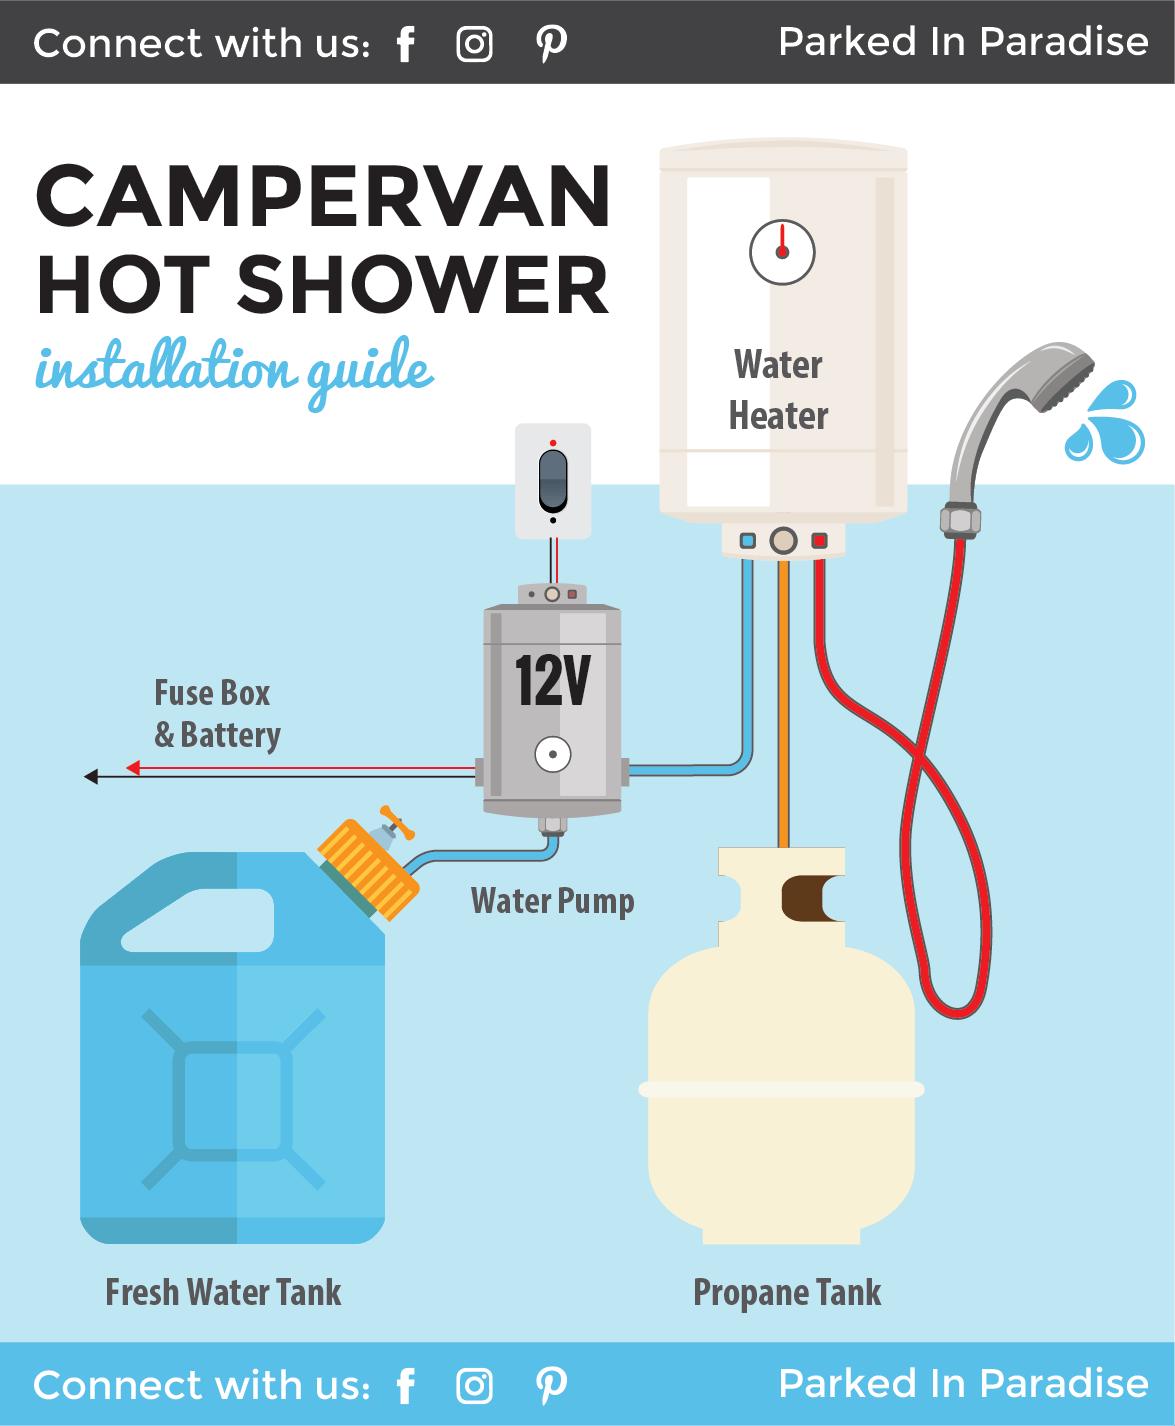 Installing A Portable 12v Water Heater In A Camper Van Camp Dusche Wohnmobil Und Campingdusche